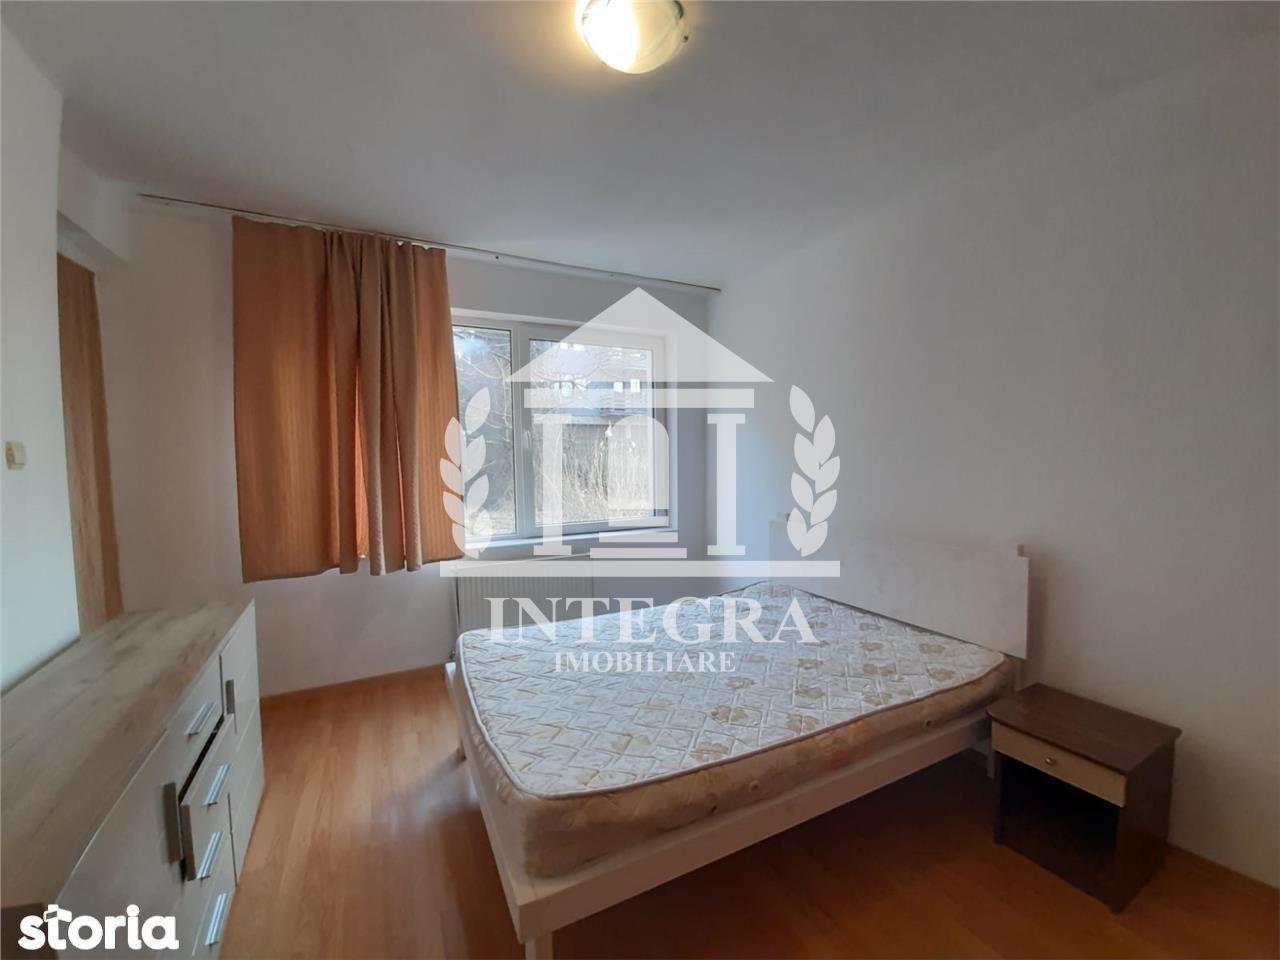 Apartament 2 Dormitoare Decomandate+Terasa,Zorilor!